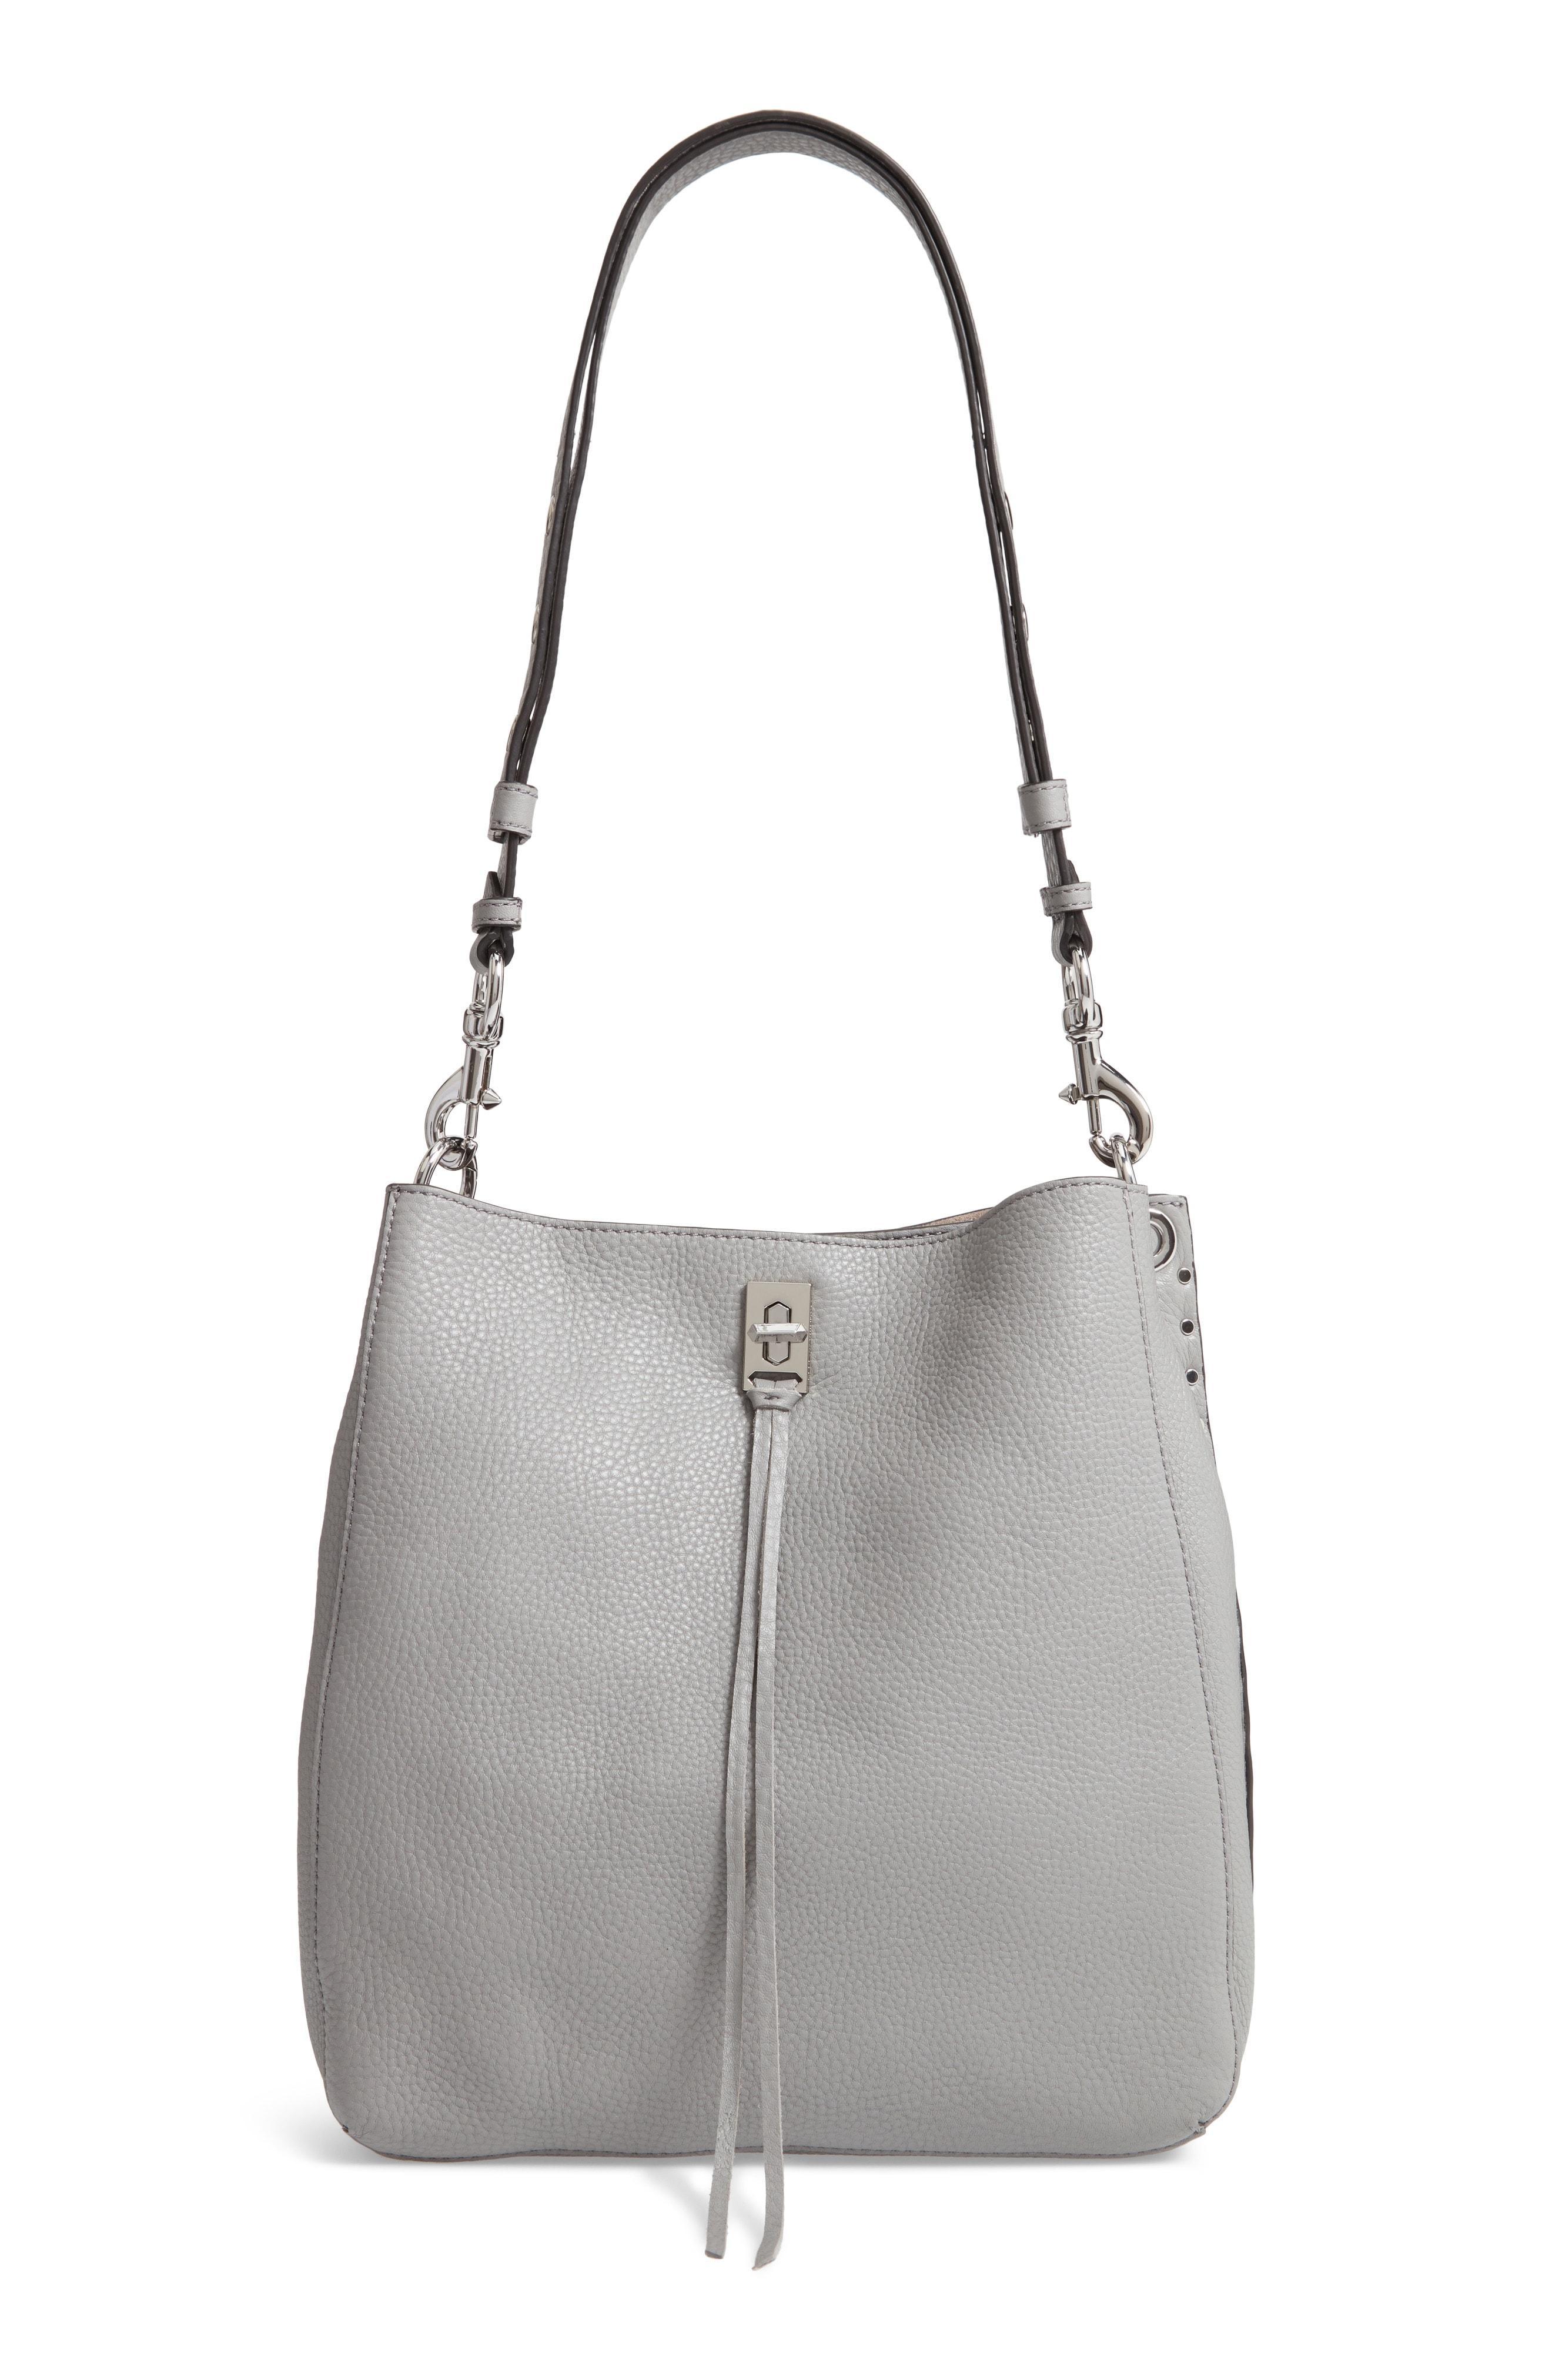 e5aeee69a8 Lyst - Rebecca Minkoff Darren Deerskin Leather Shoulder Bag in Black ...